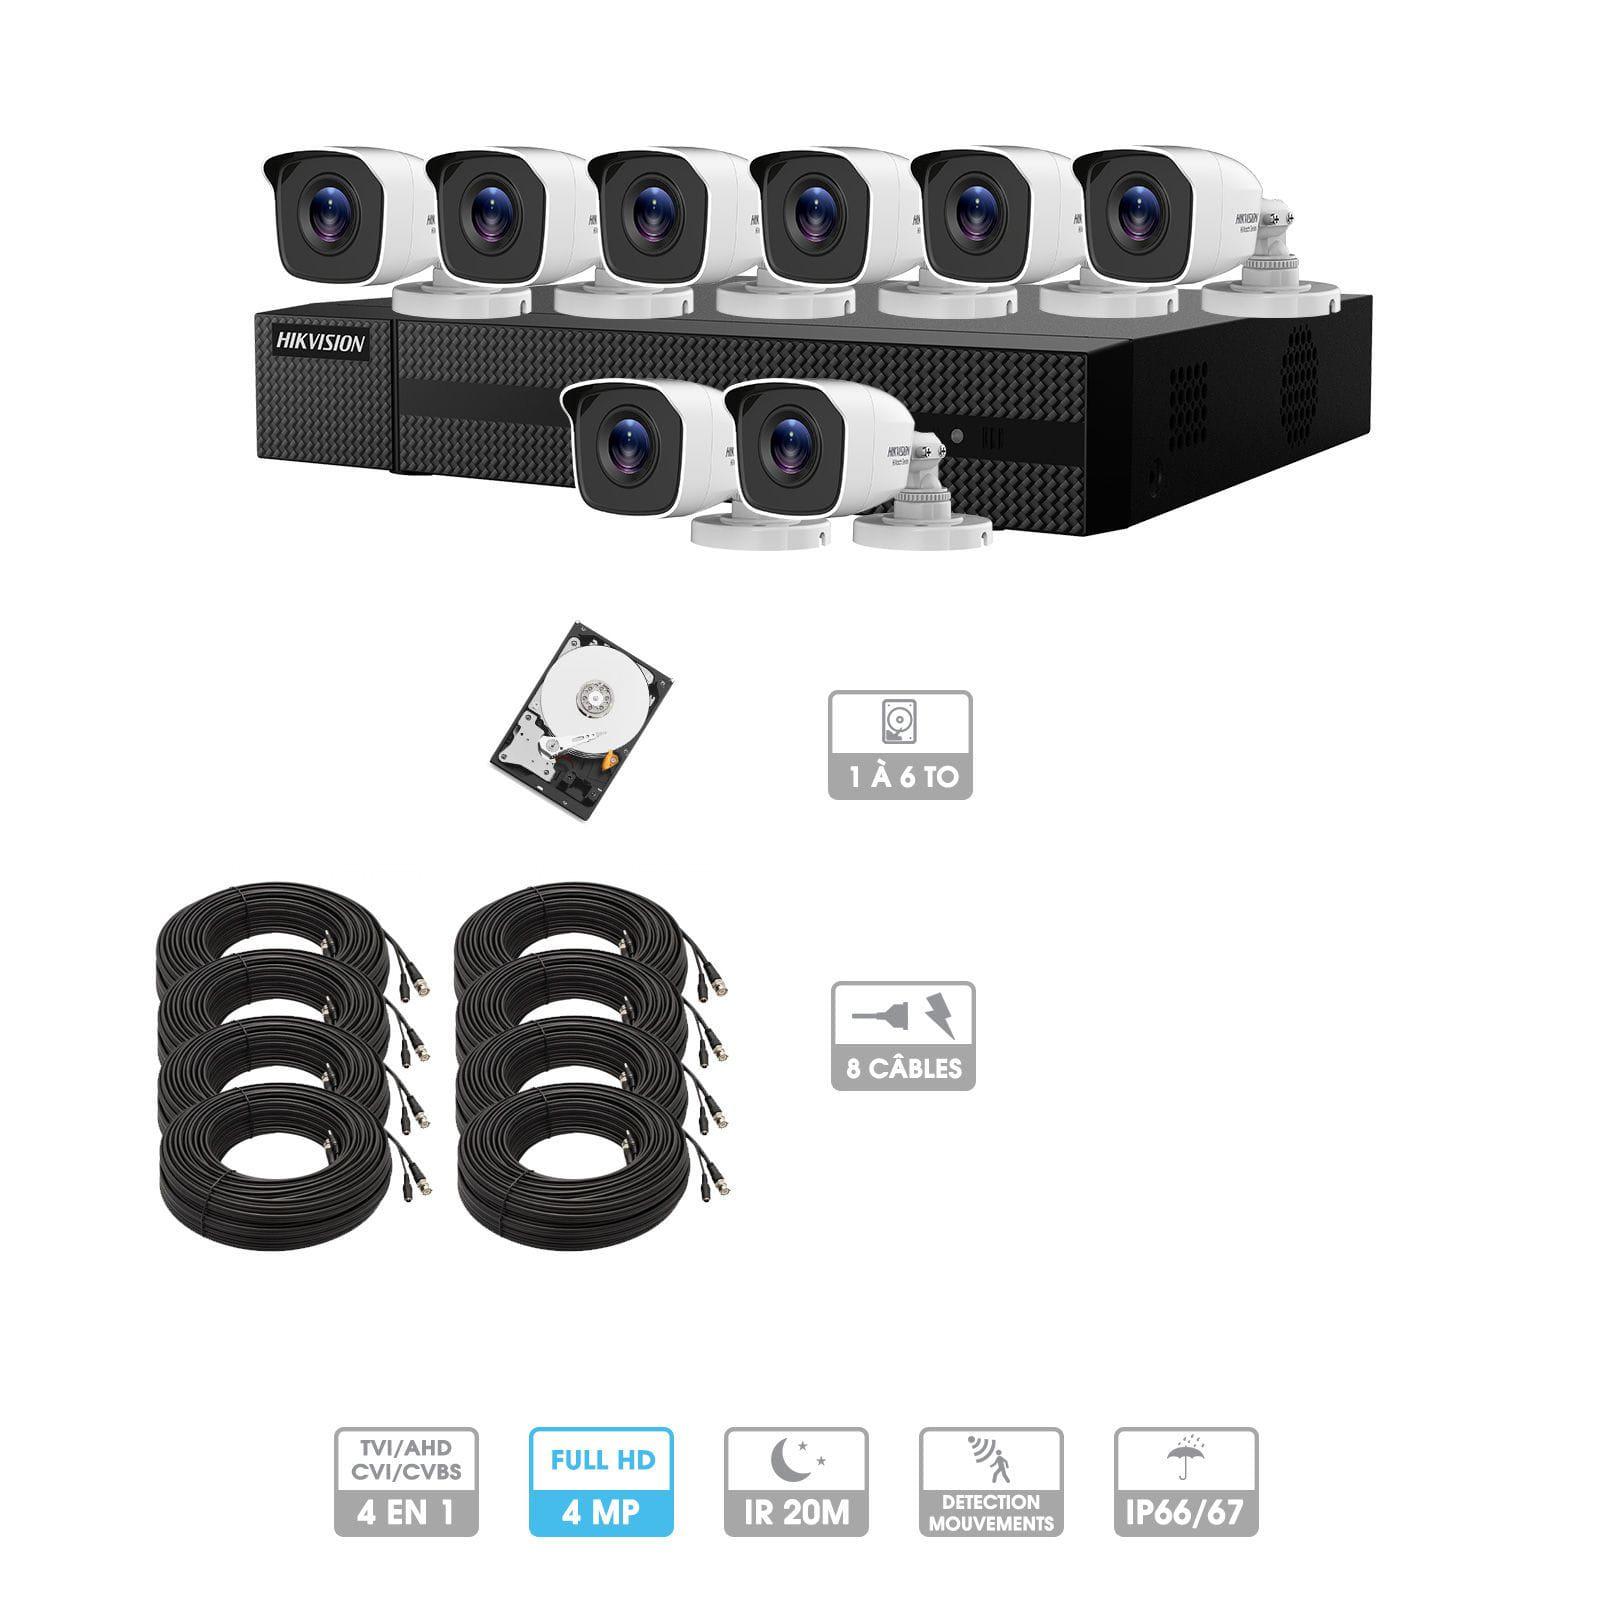 Kit vidéosurveillance 8 caméras | 4MP HD | 8 câbles 20 mètres | HDD 1To | Tube Hiwatch